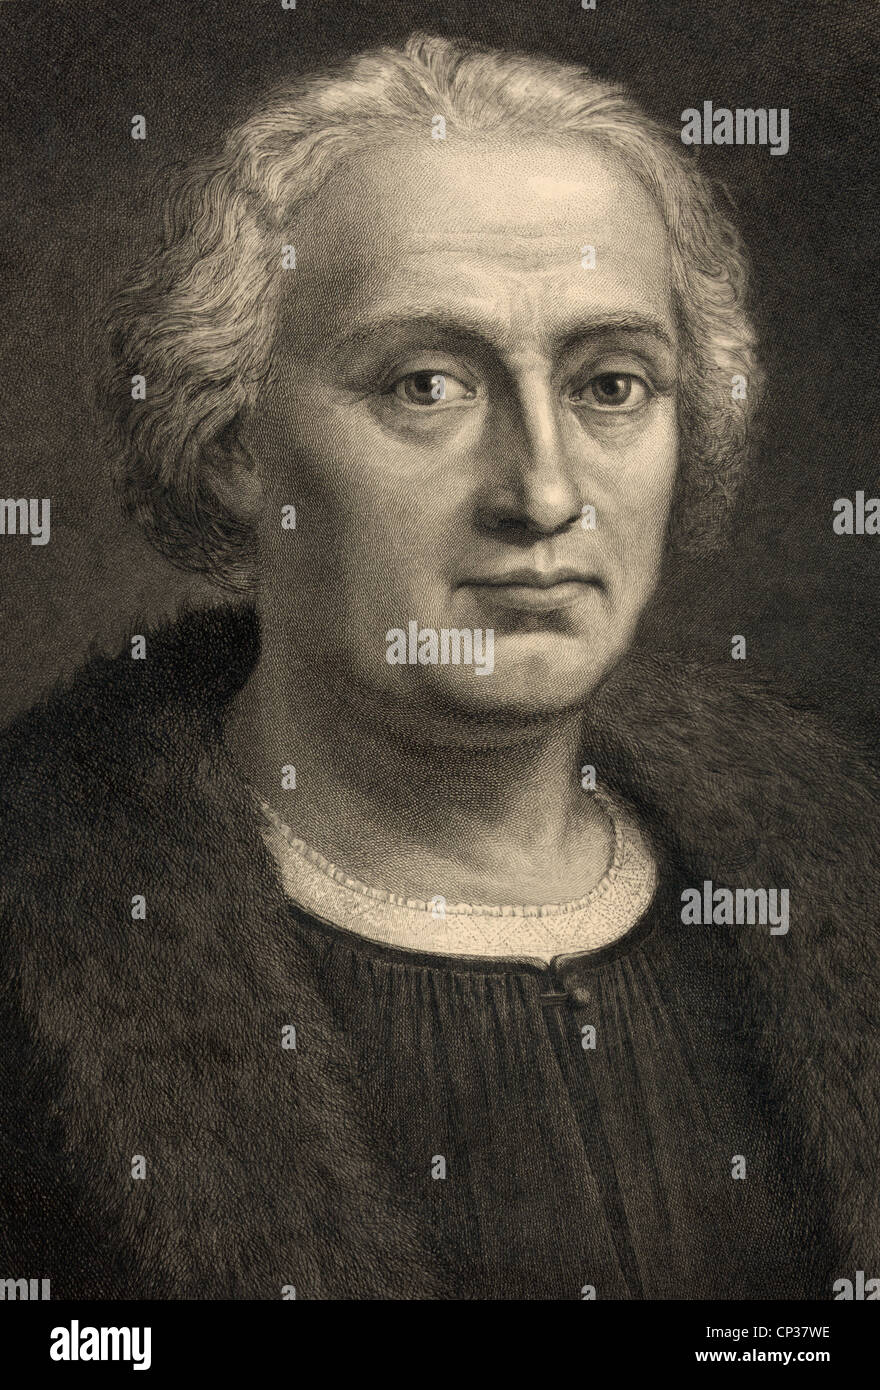 Christopher Columbus 1451-1506. Italian born Spanish financed explorer discoverer of America. Stock Photo